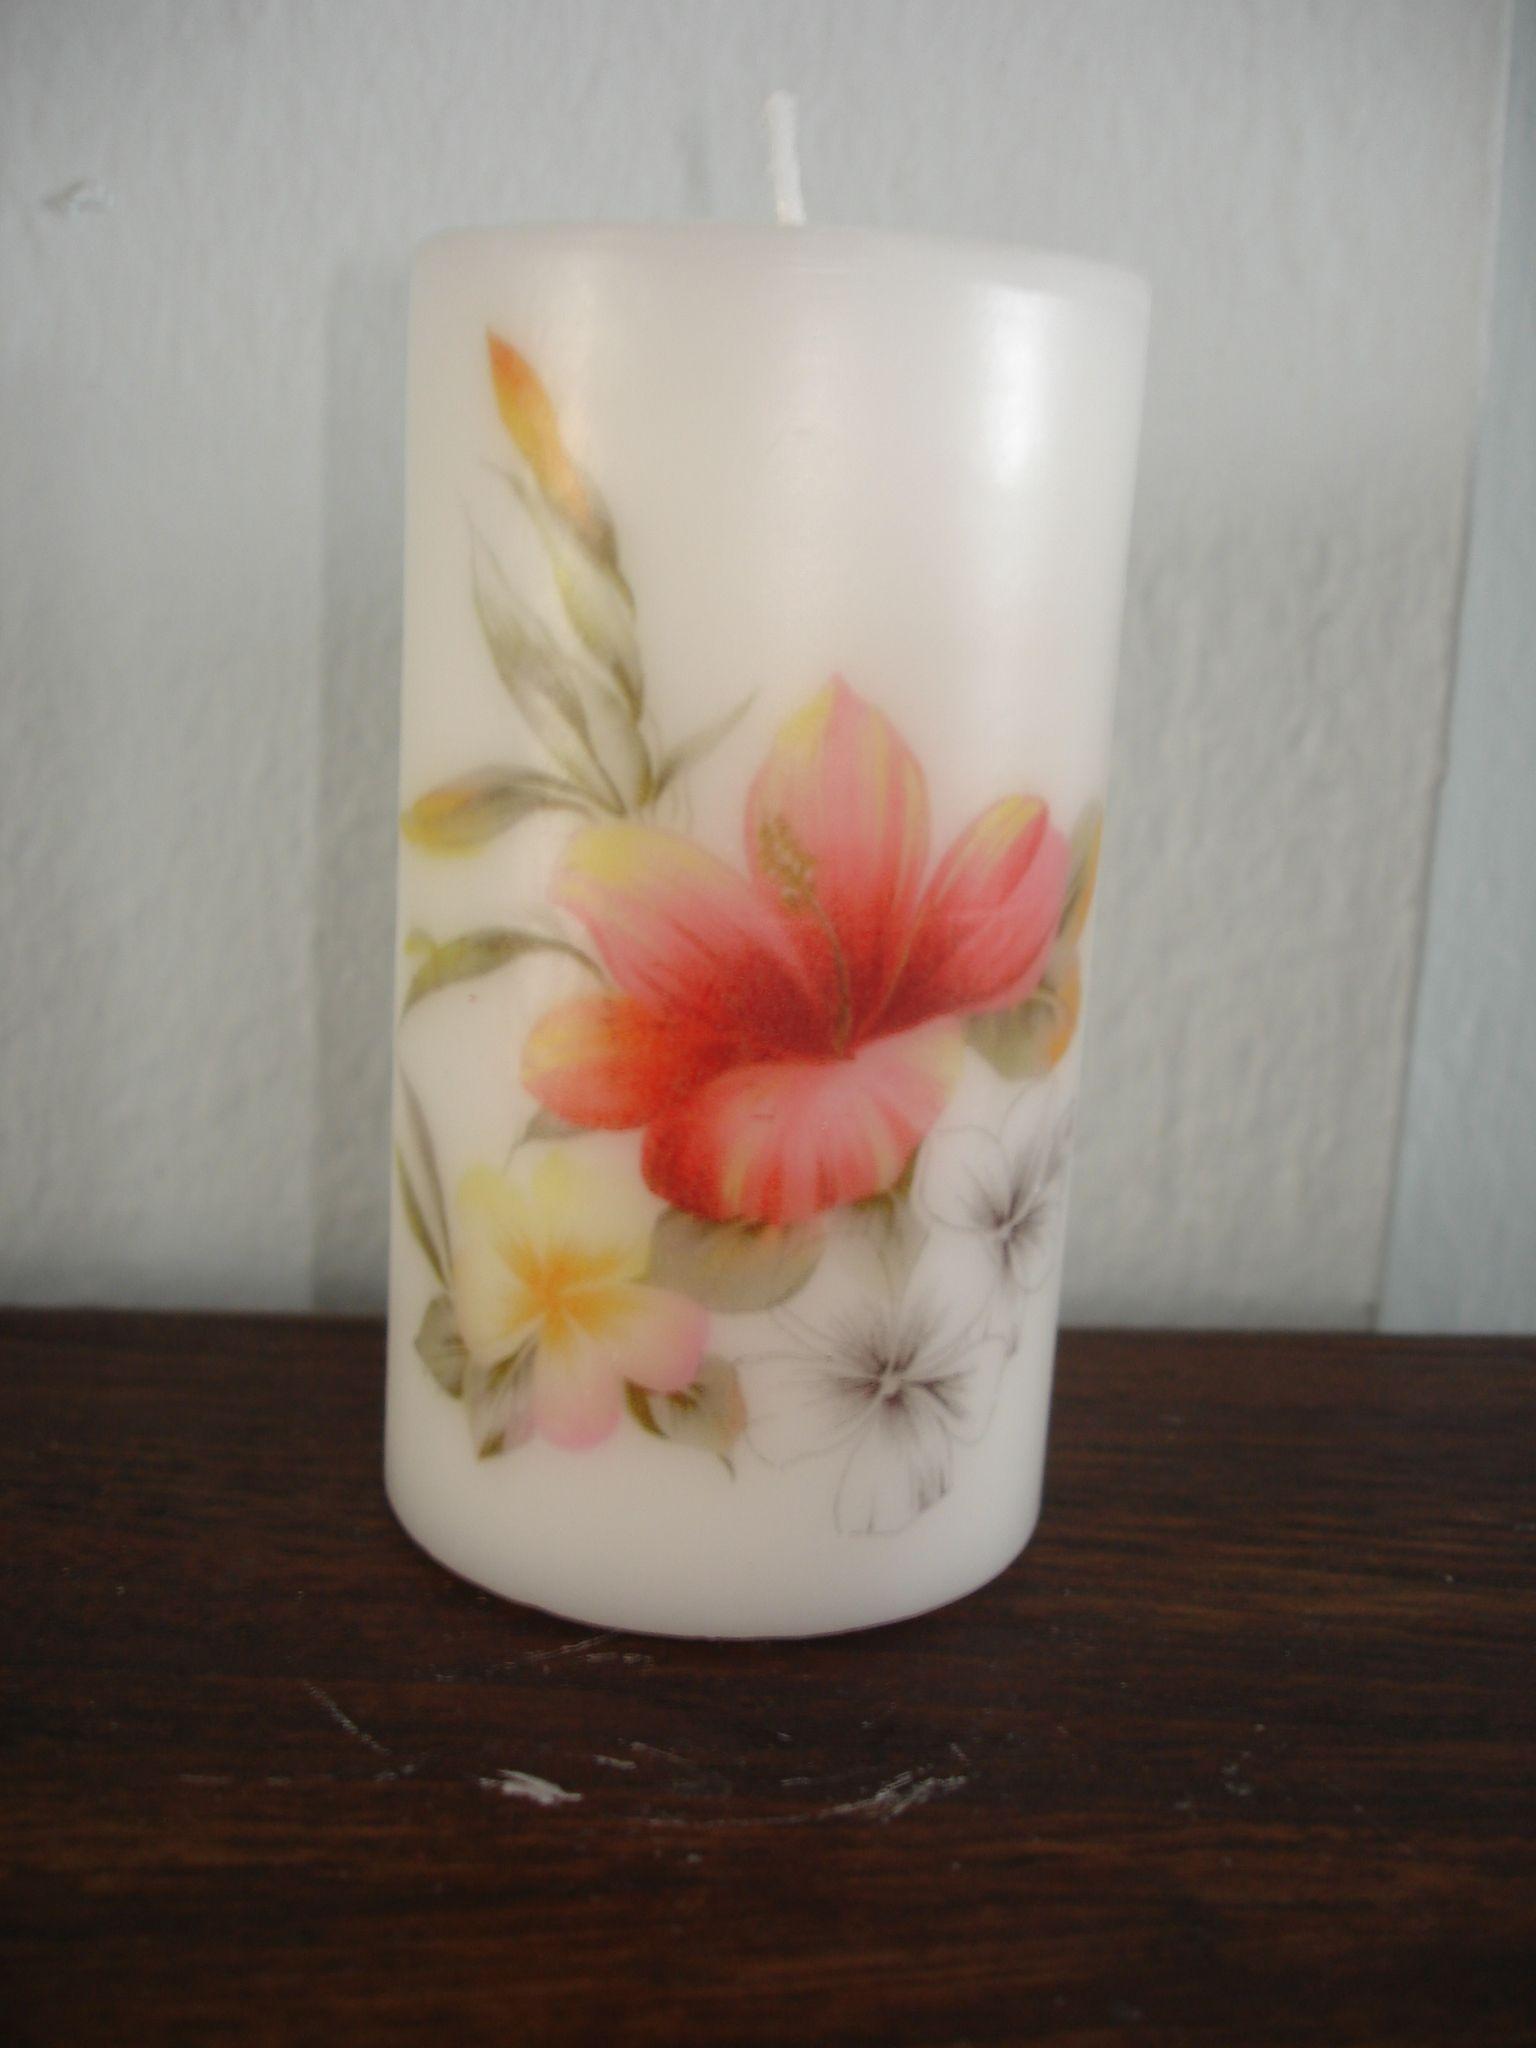 Chiang mai art candle velas pinterest velas velas - Porta velas navidenas ...